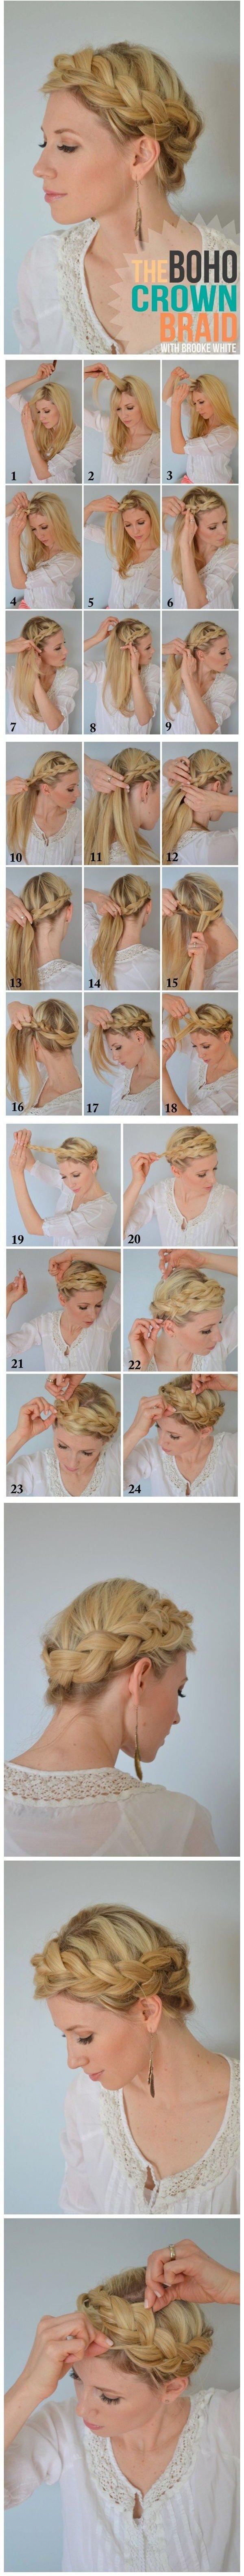 How To Make Boho Crown Braid Tutorial 37 Stunning